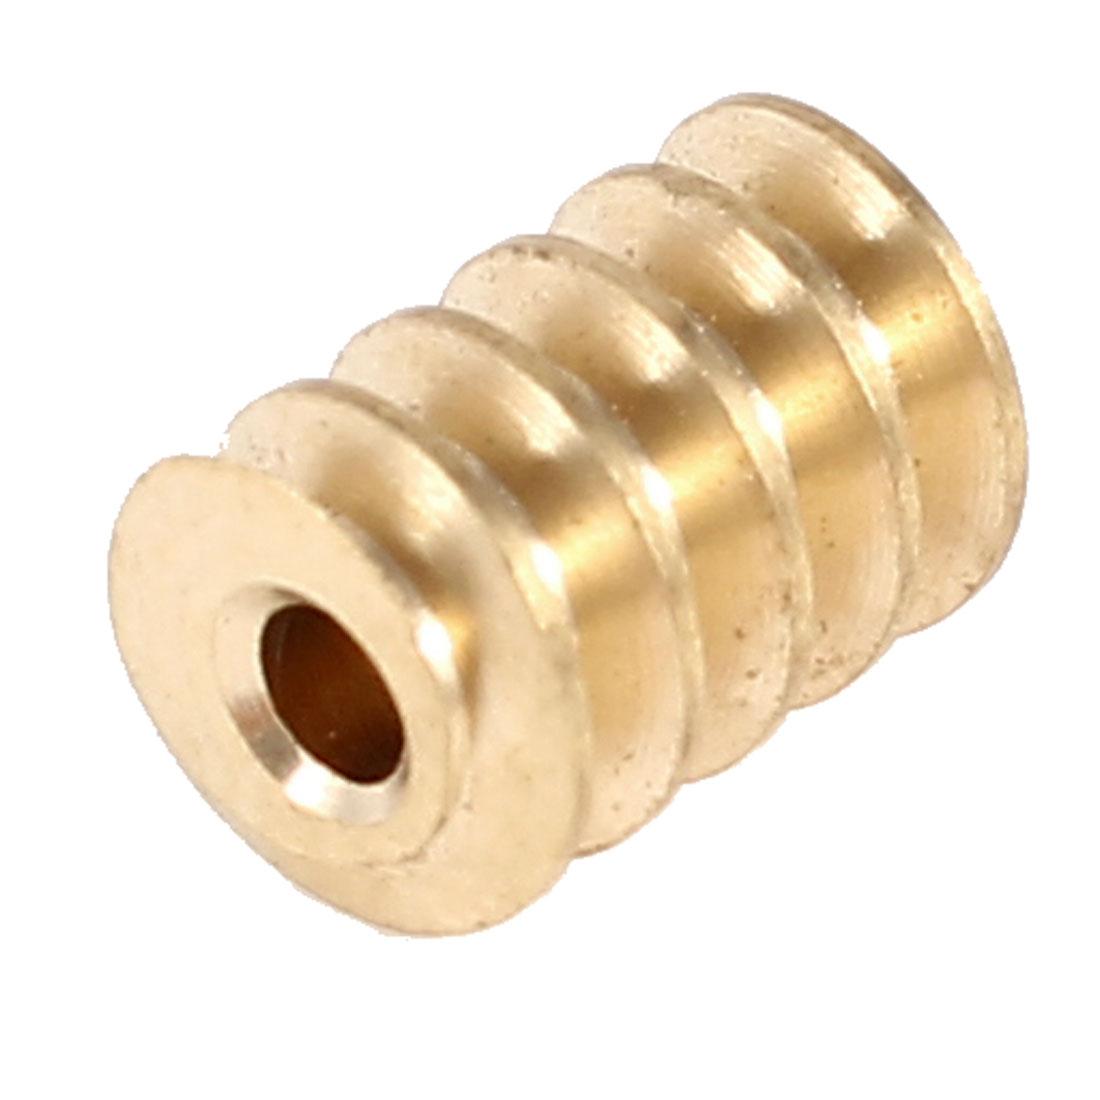 M0.5x8T 8 Teeth 2mm Dia Shaft Hole DC Gearbox Motor Worm Gear Gold Tone